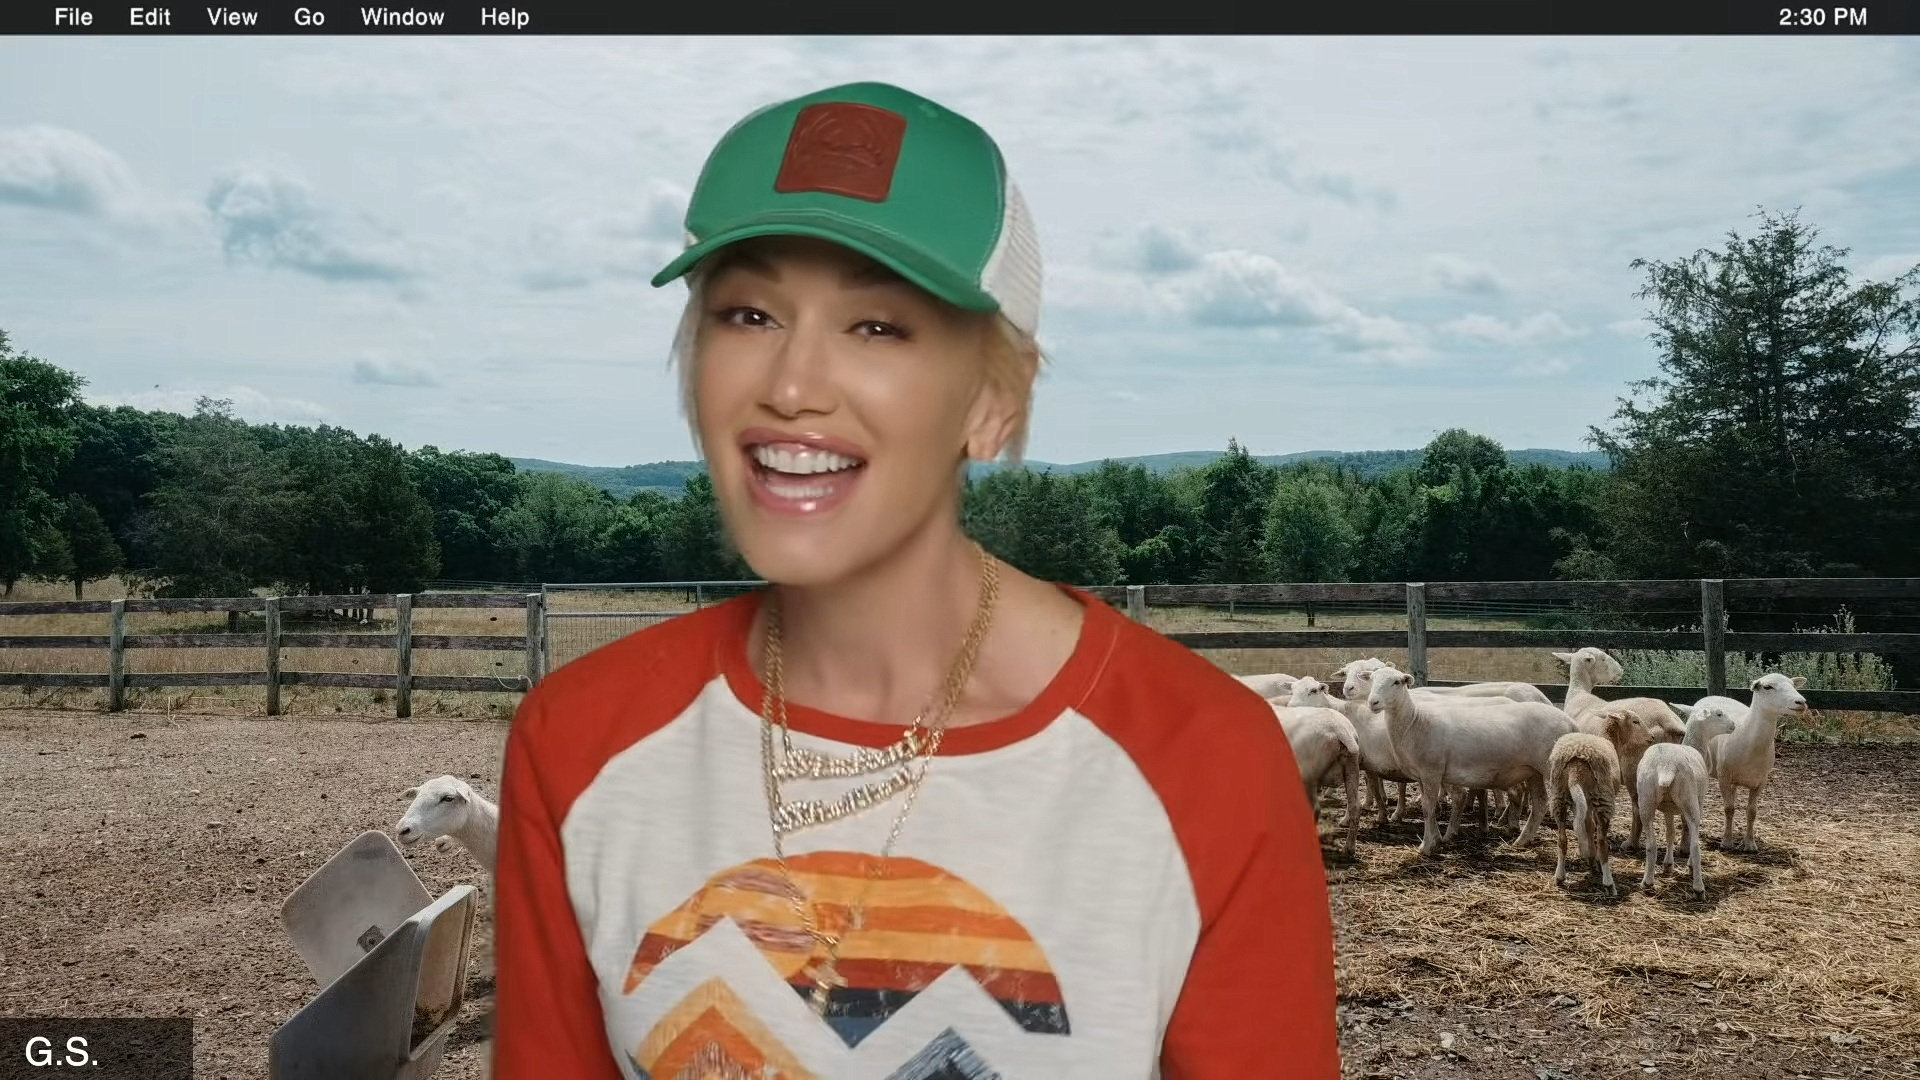 Gwen Stefani - Let Me Reintroduce Myself (Official Video) 2-0 Screenshot